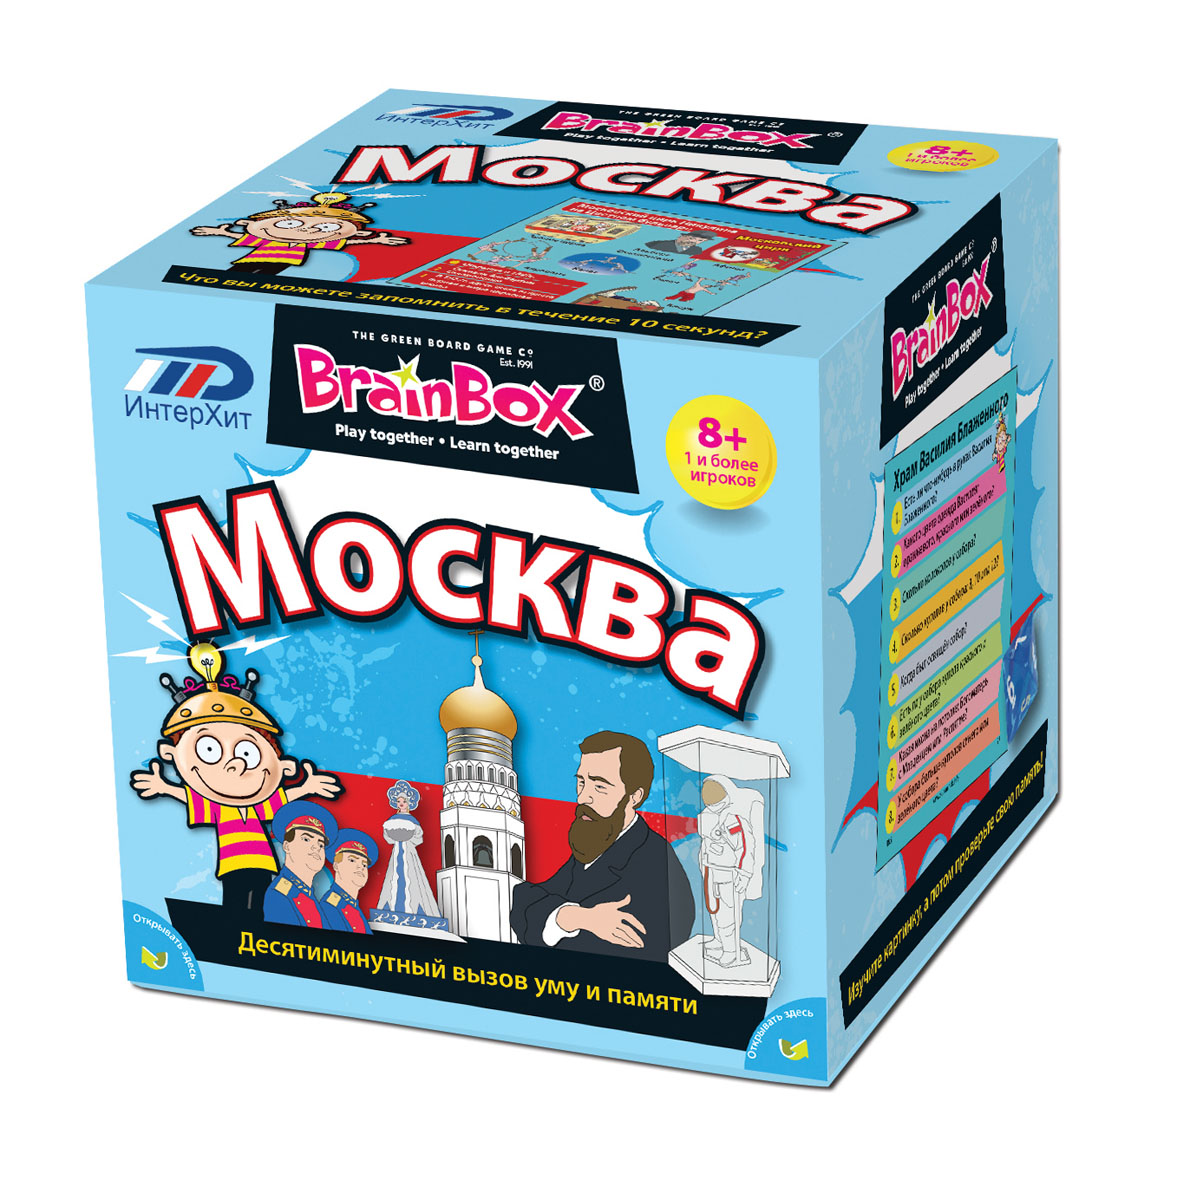 BrainBox Обучающая игра Сундучок знаний Москва настольная игра развивающая brainbox сундучок знаний мир динозавров 90738